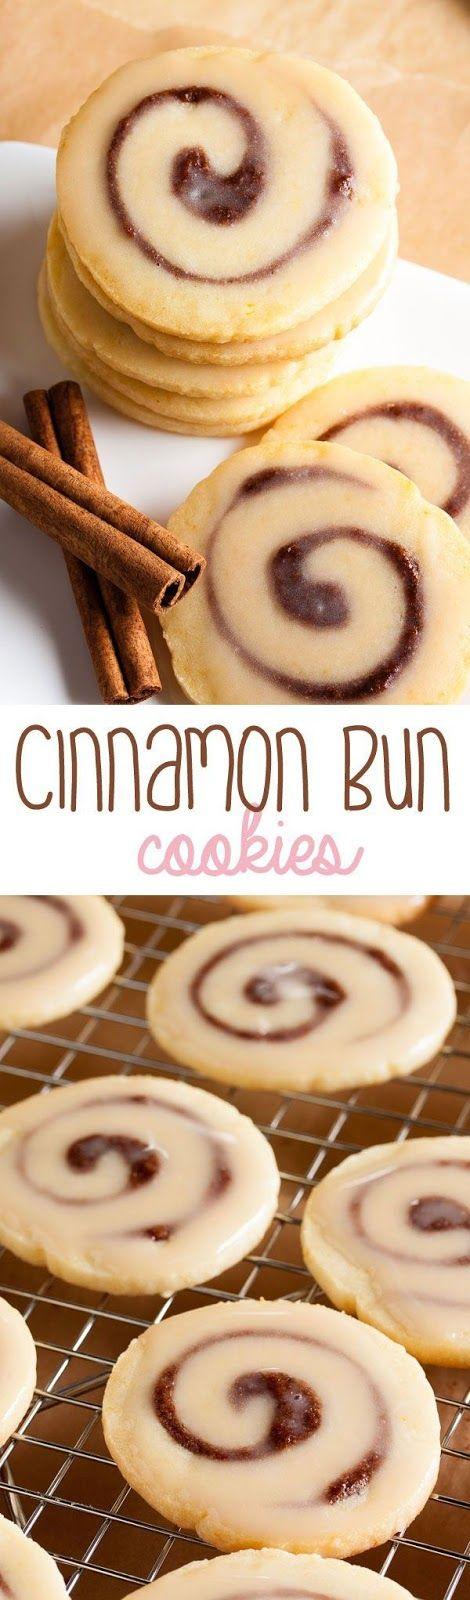 ginger bread cookies recipe christmas holiday baking better baking bible blog